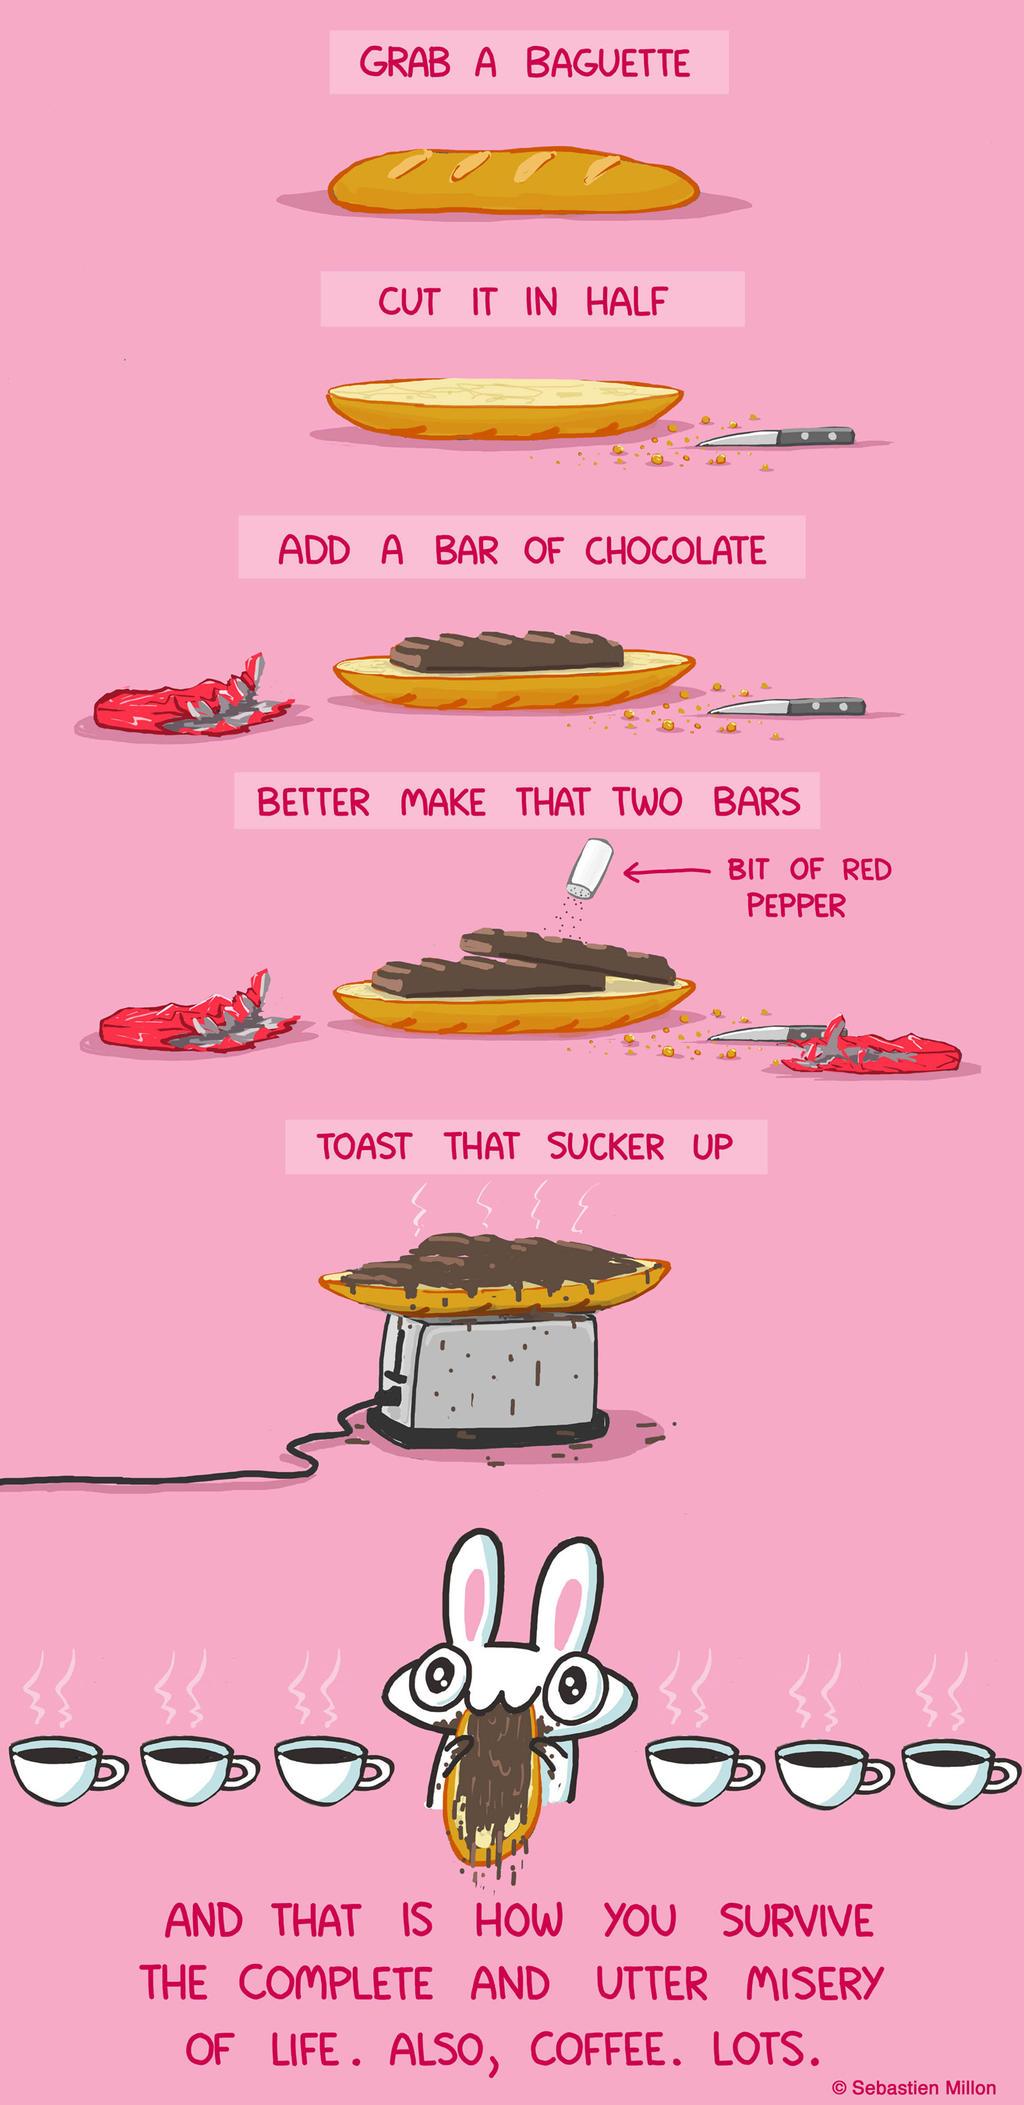 Survival Snack by sebreg